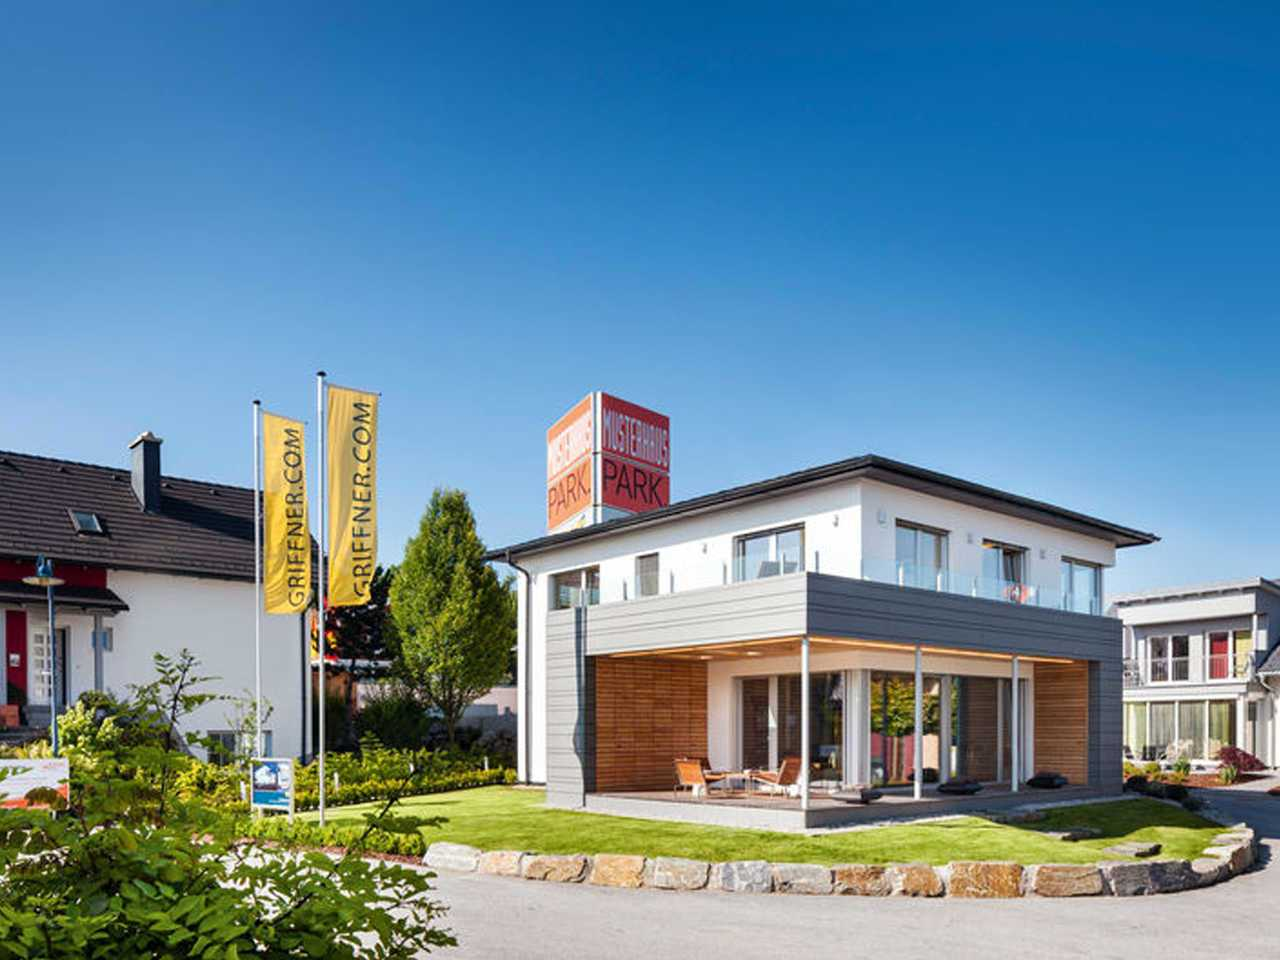 Musterhauspark in Eugendorf Teaser